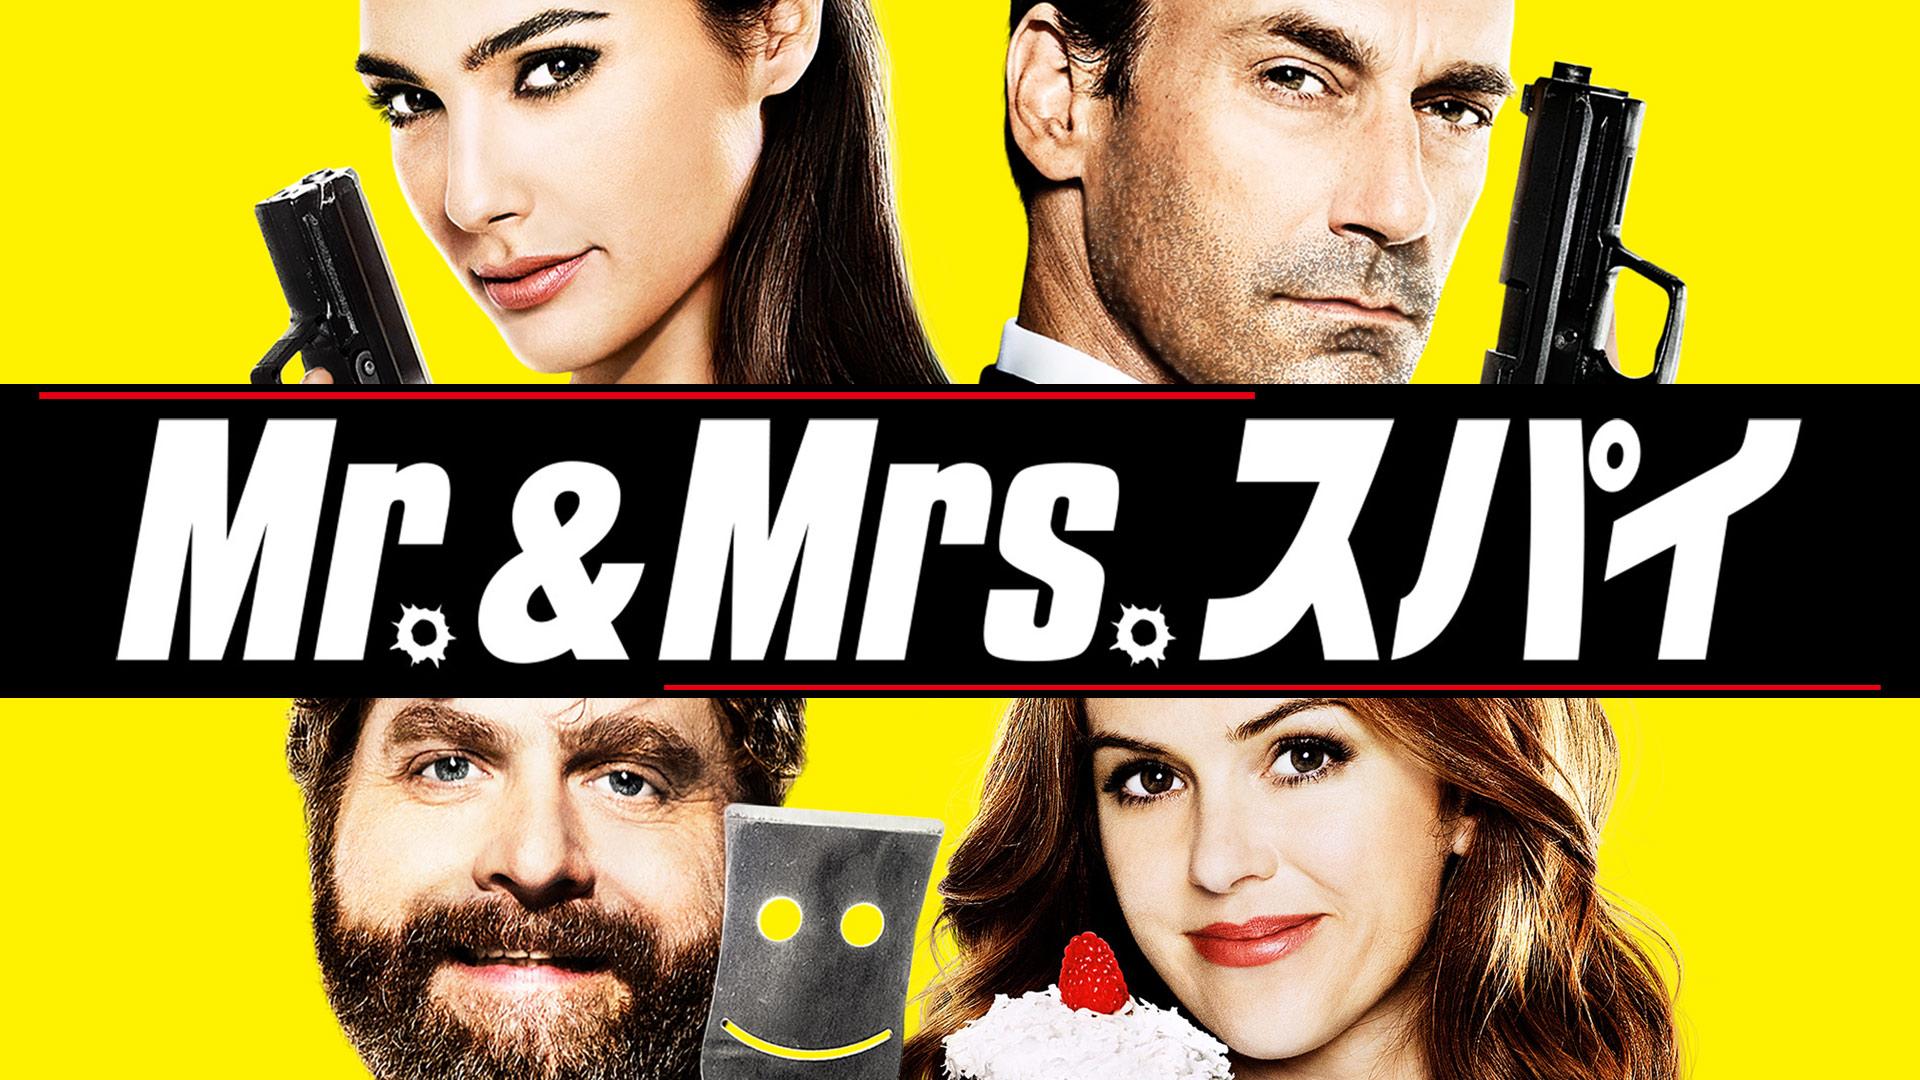 Mr. & Mrs. スパイ (字幕版)